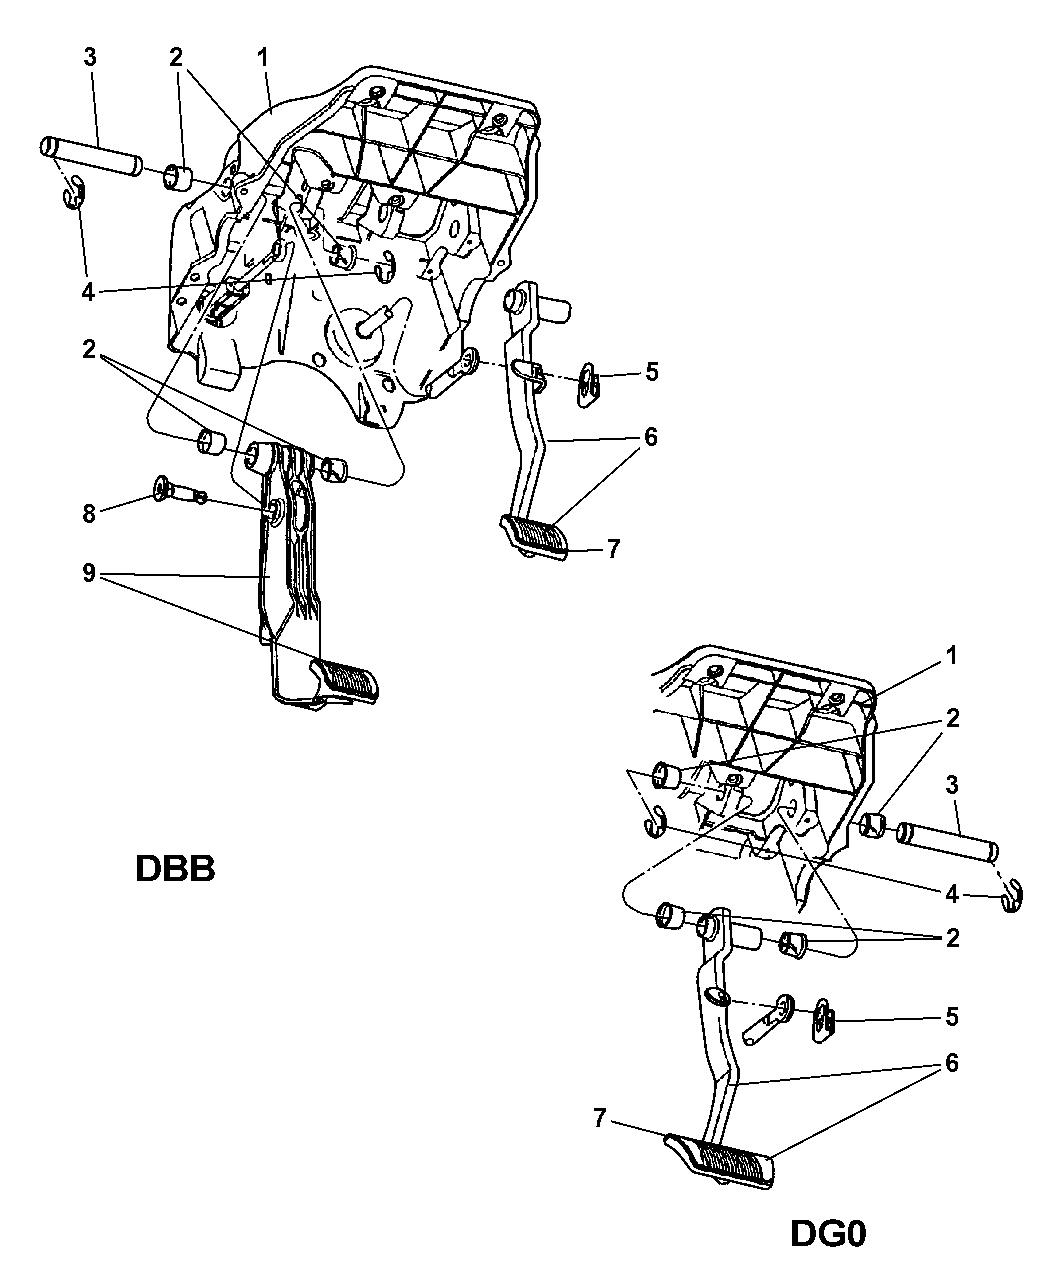 2004 Dodge Ram 1500 Brake Pedal of Service Brakes